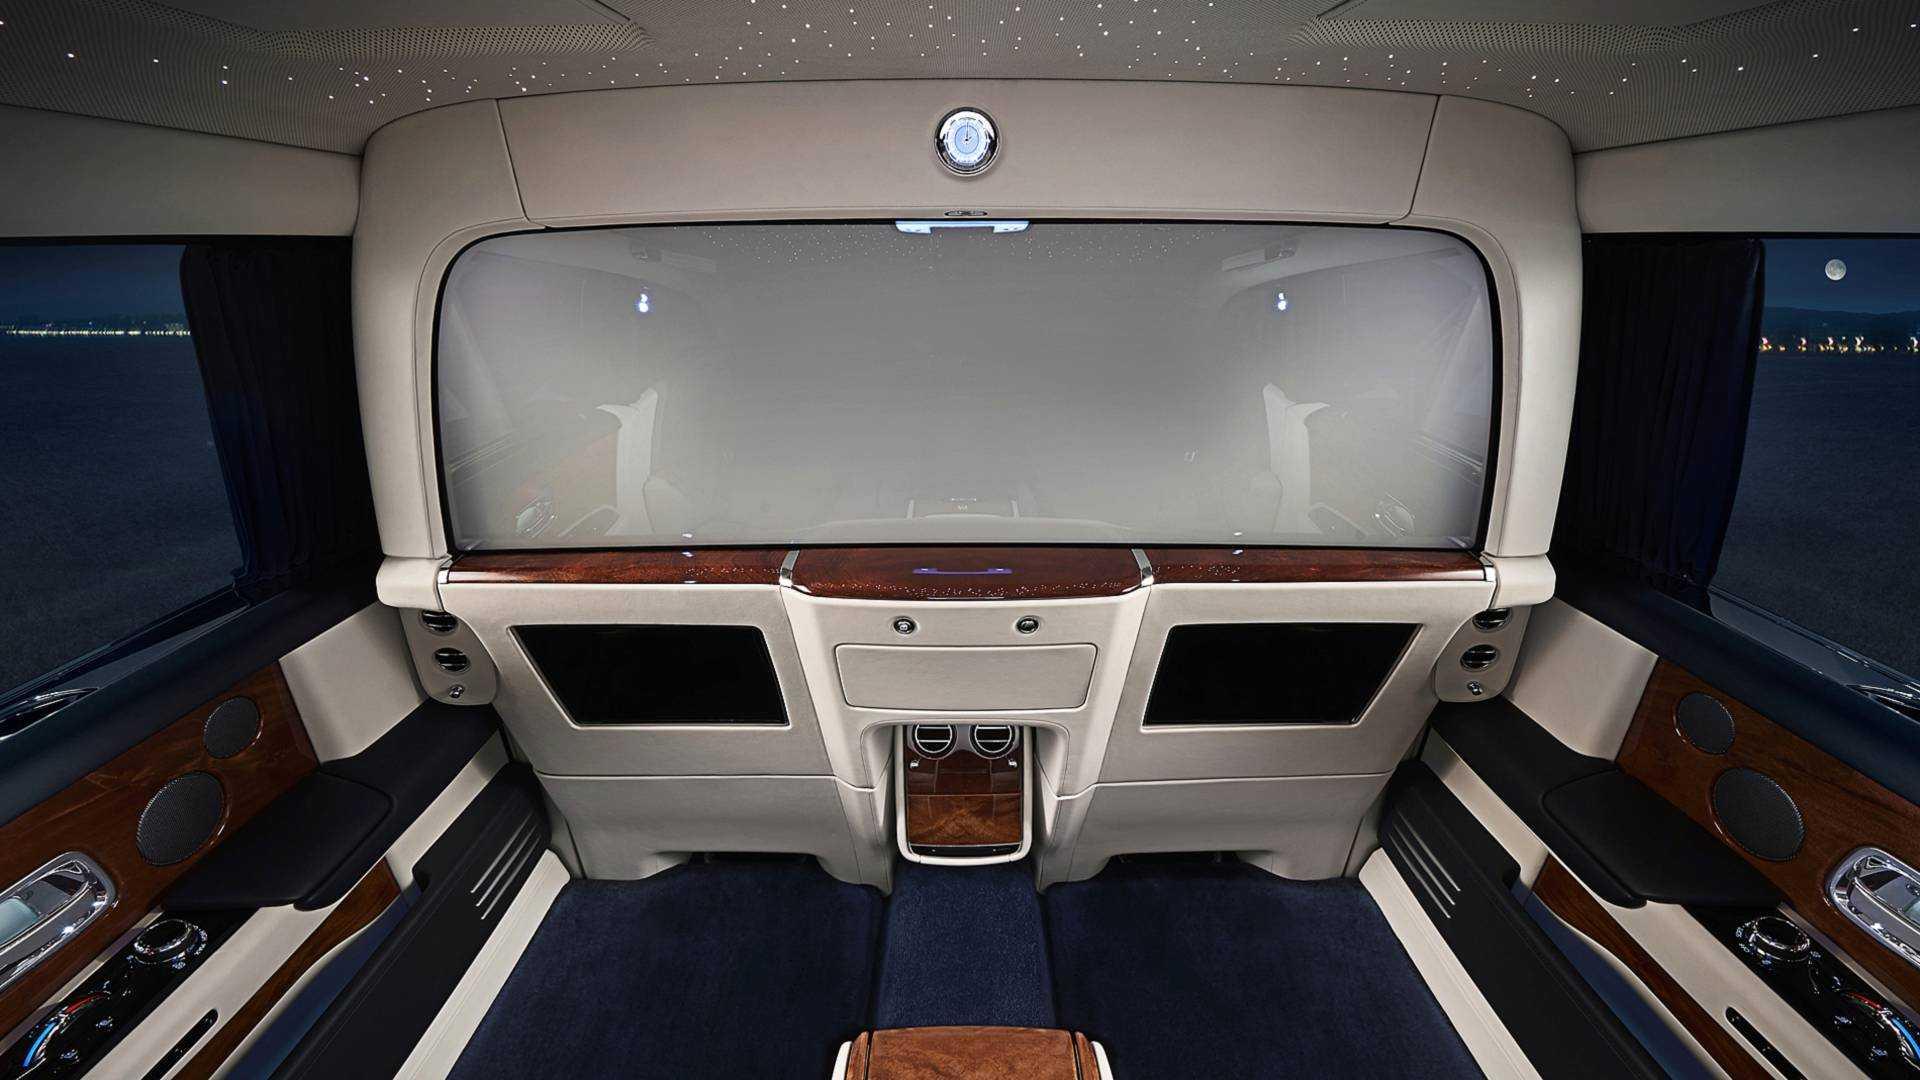 Rolls Royce Reveals Privacy Suite For New Phantom